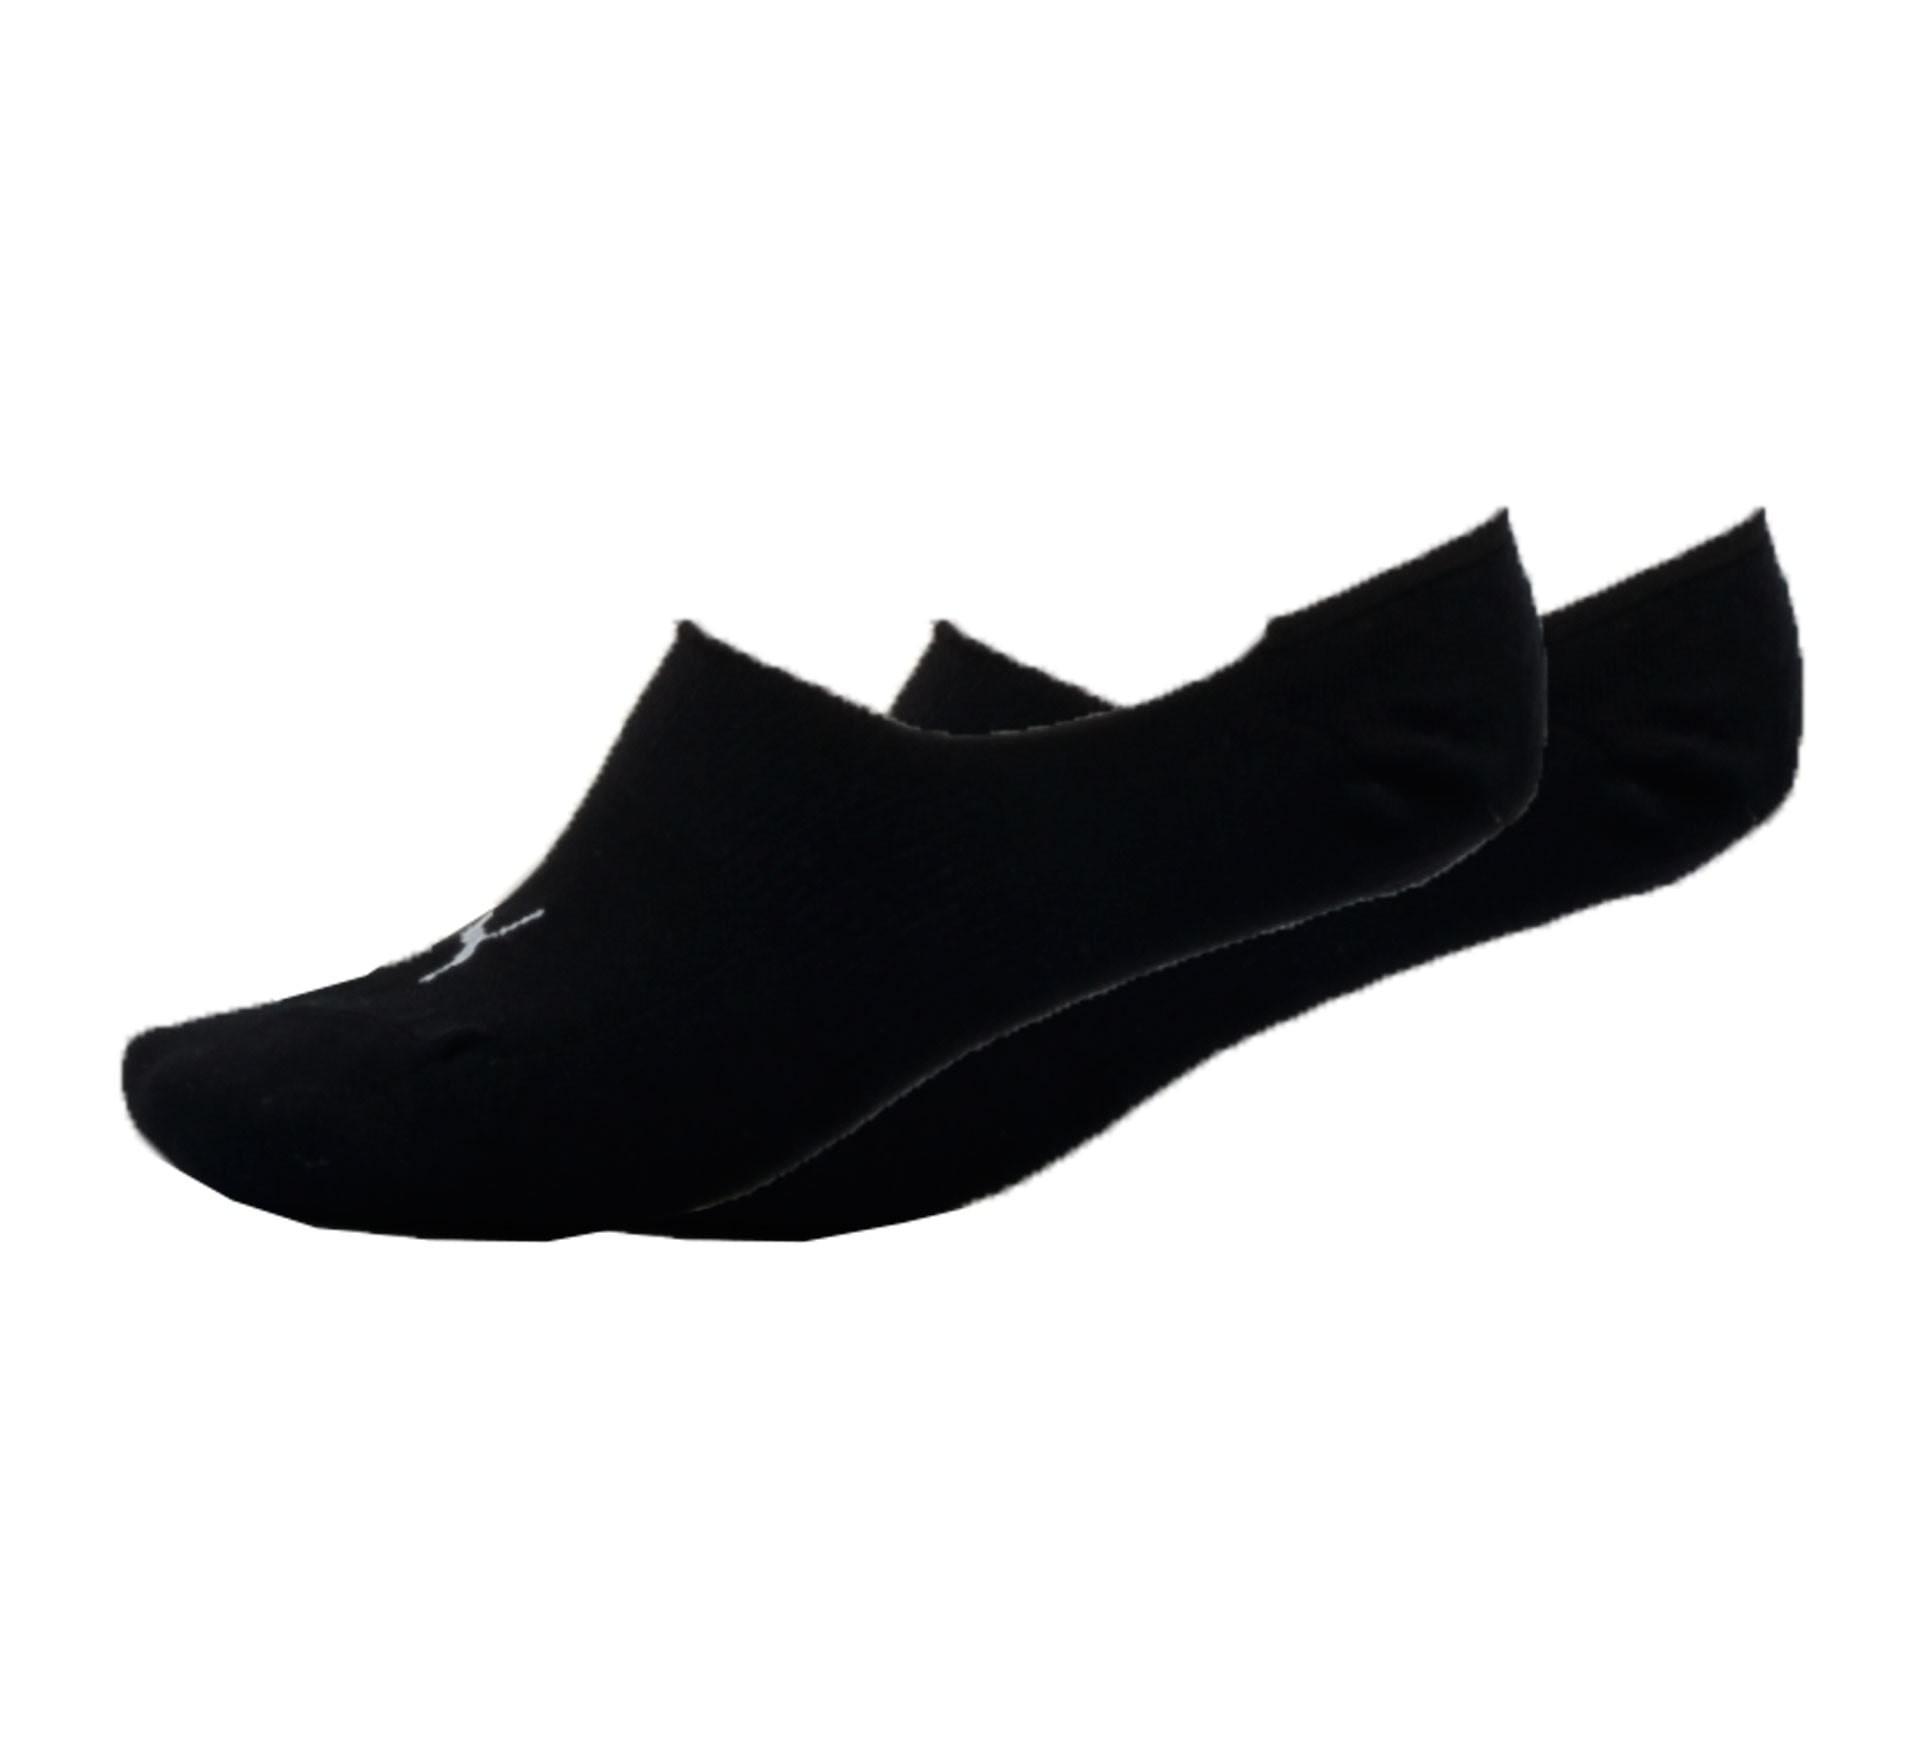 Dagaanbieding - Dagaanbieding Puma Footies sokken dagelijkse aanbiedingen